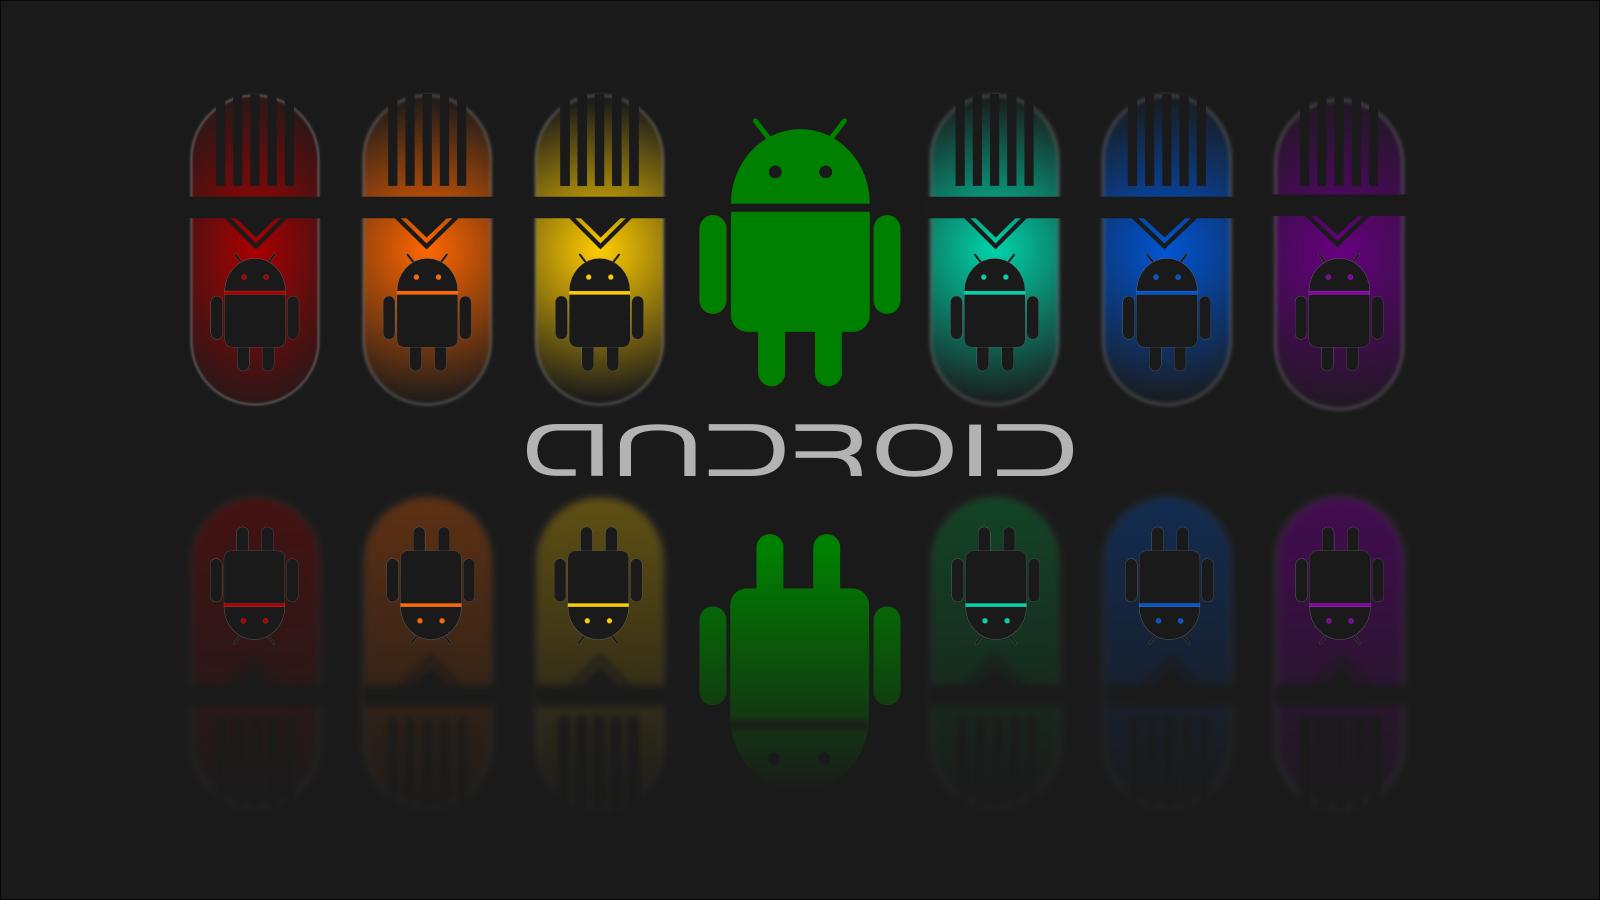 Top 10 Mejores Fondos De Pantalla Android Para Tu PC